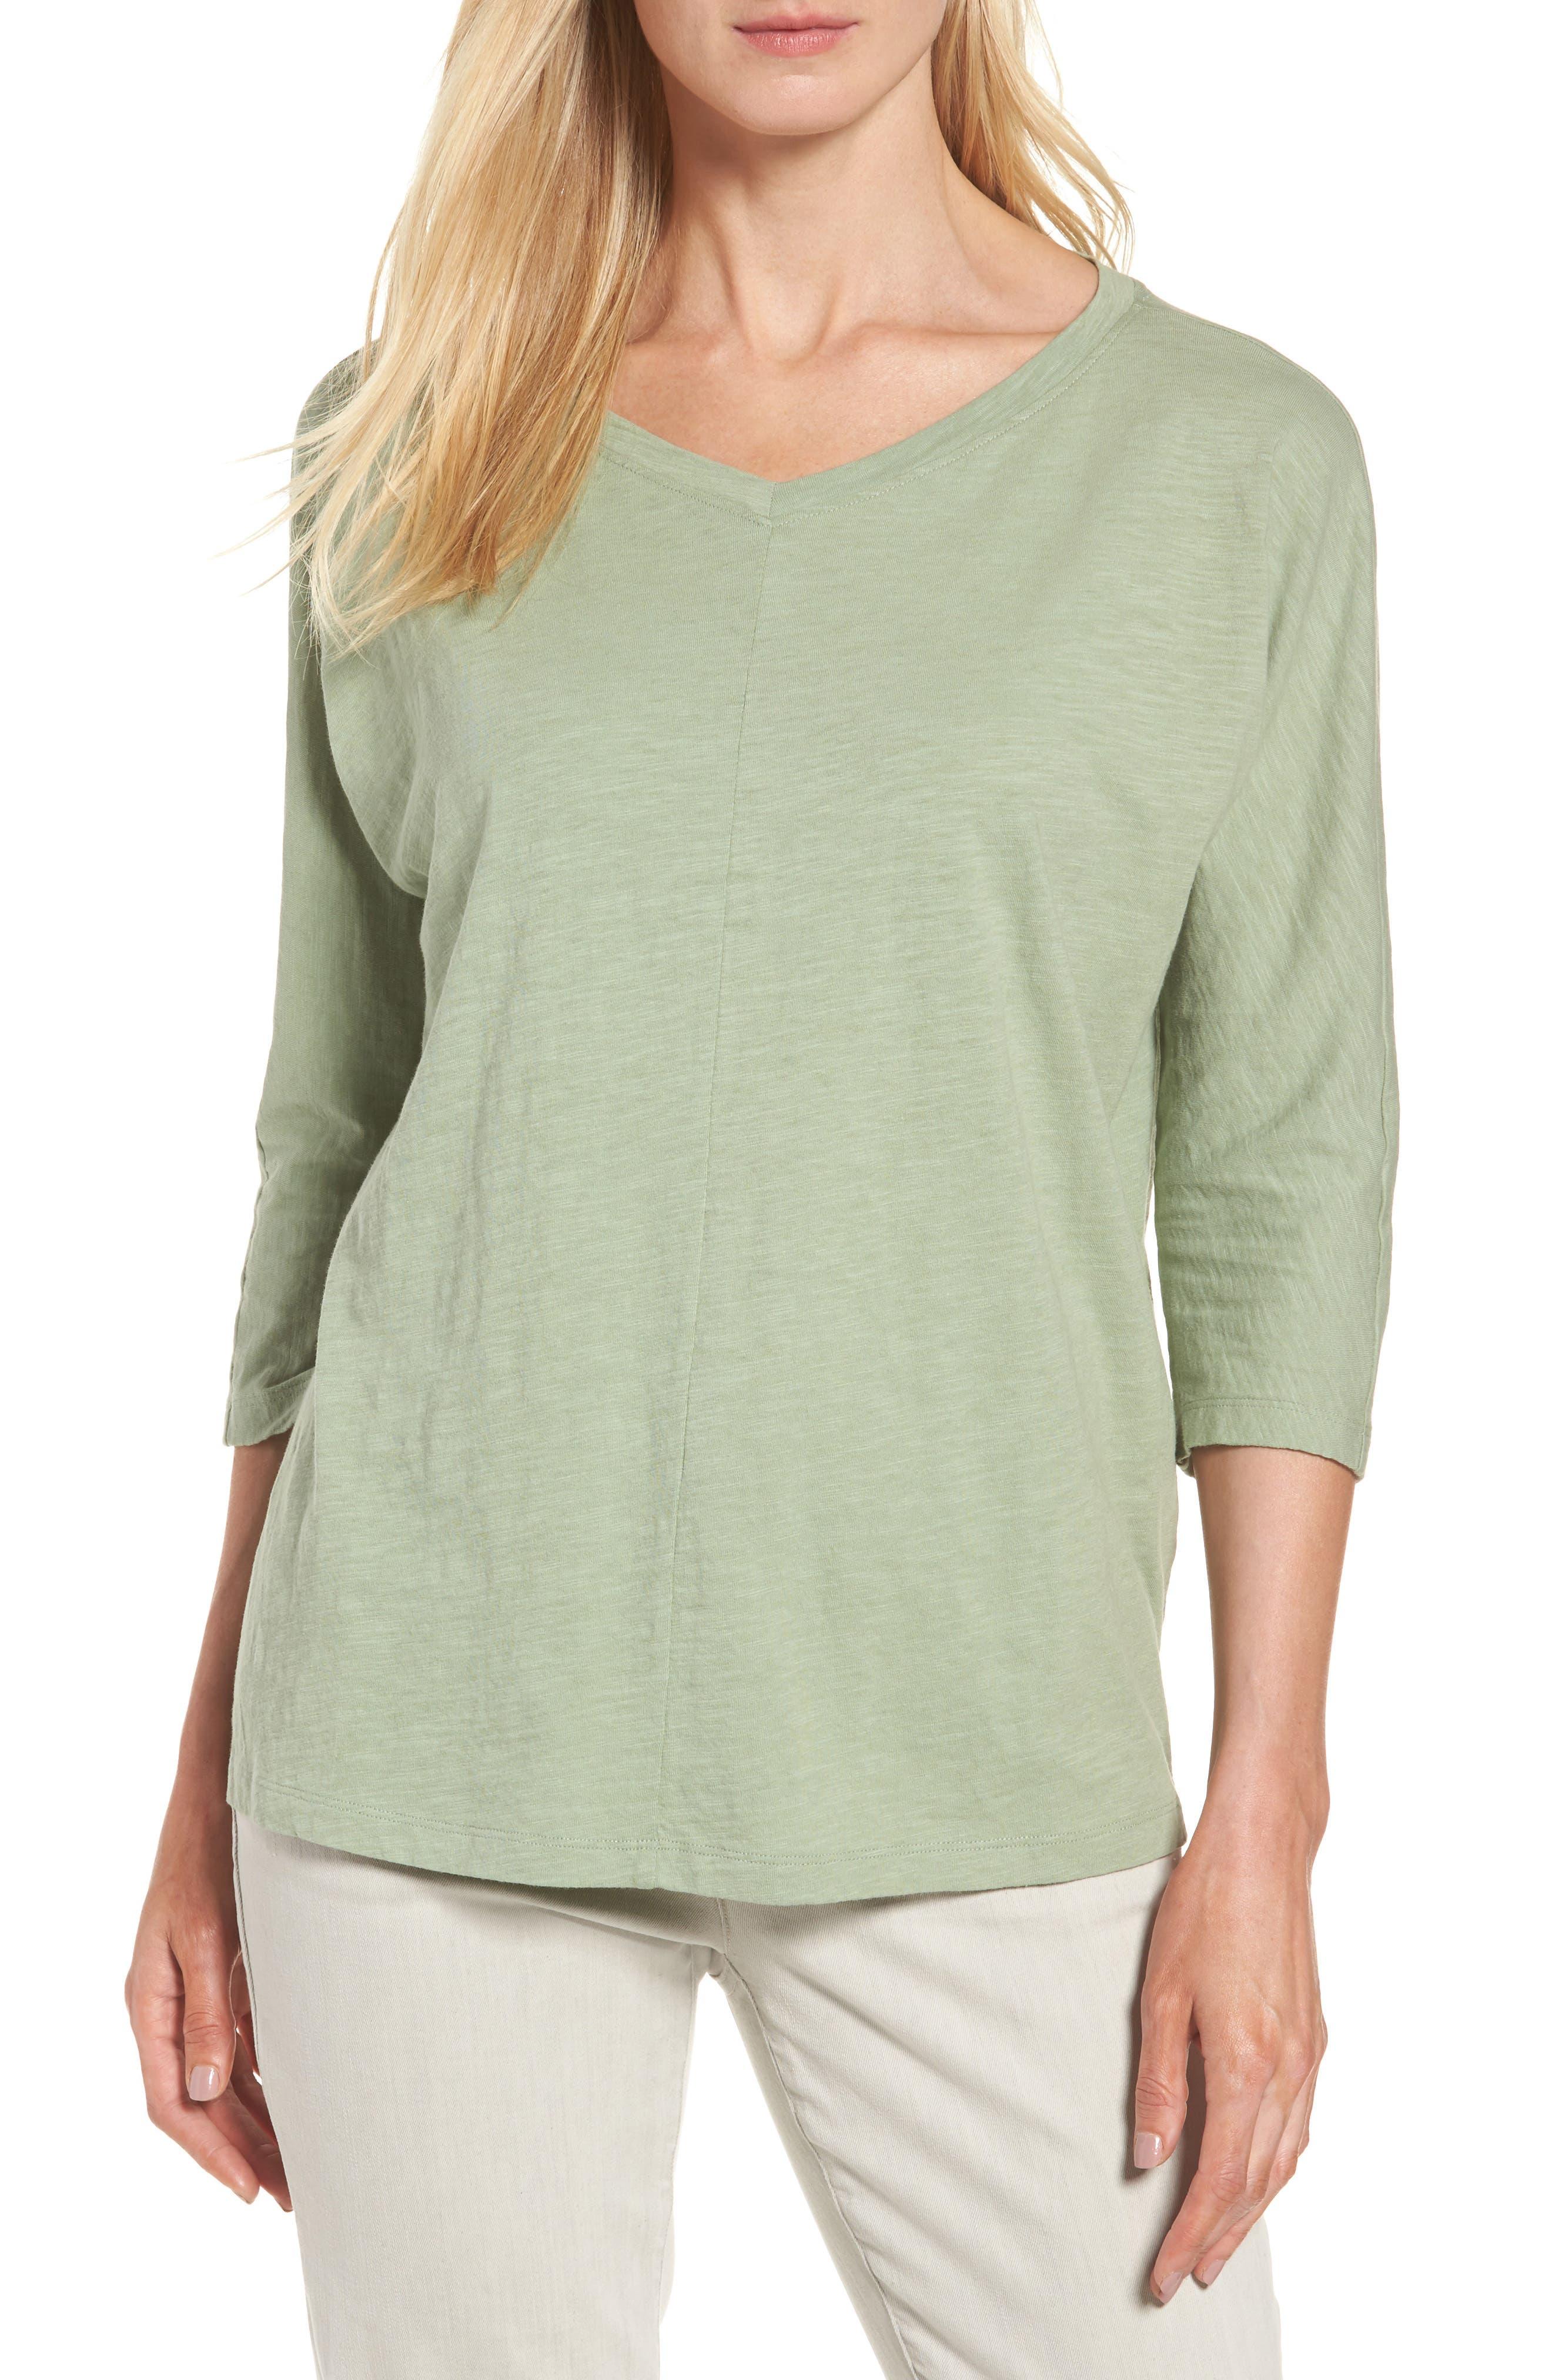 Eileen Fisher Organic Cotton Knit Boxy Top